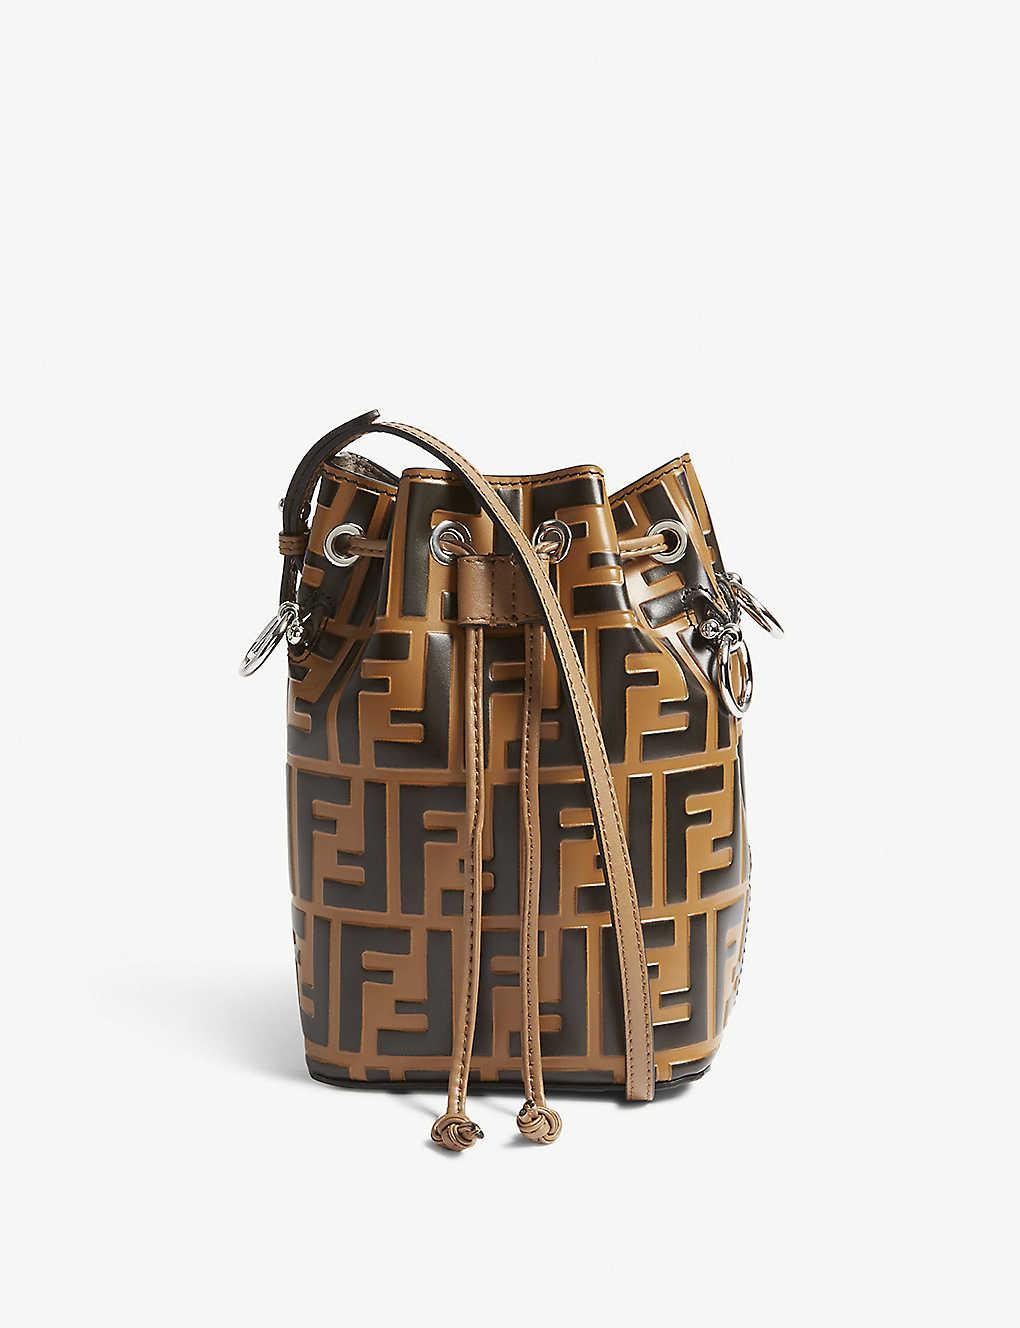 74e998967c92 FENDI - Mon Tresor small leather bucket bag